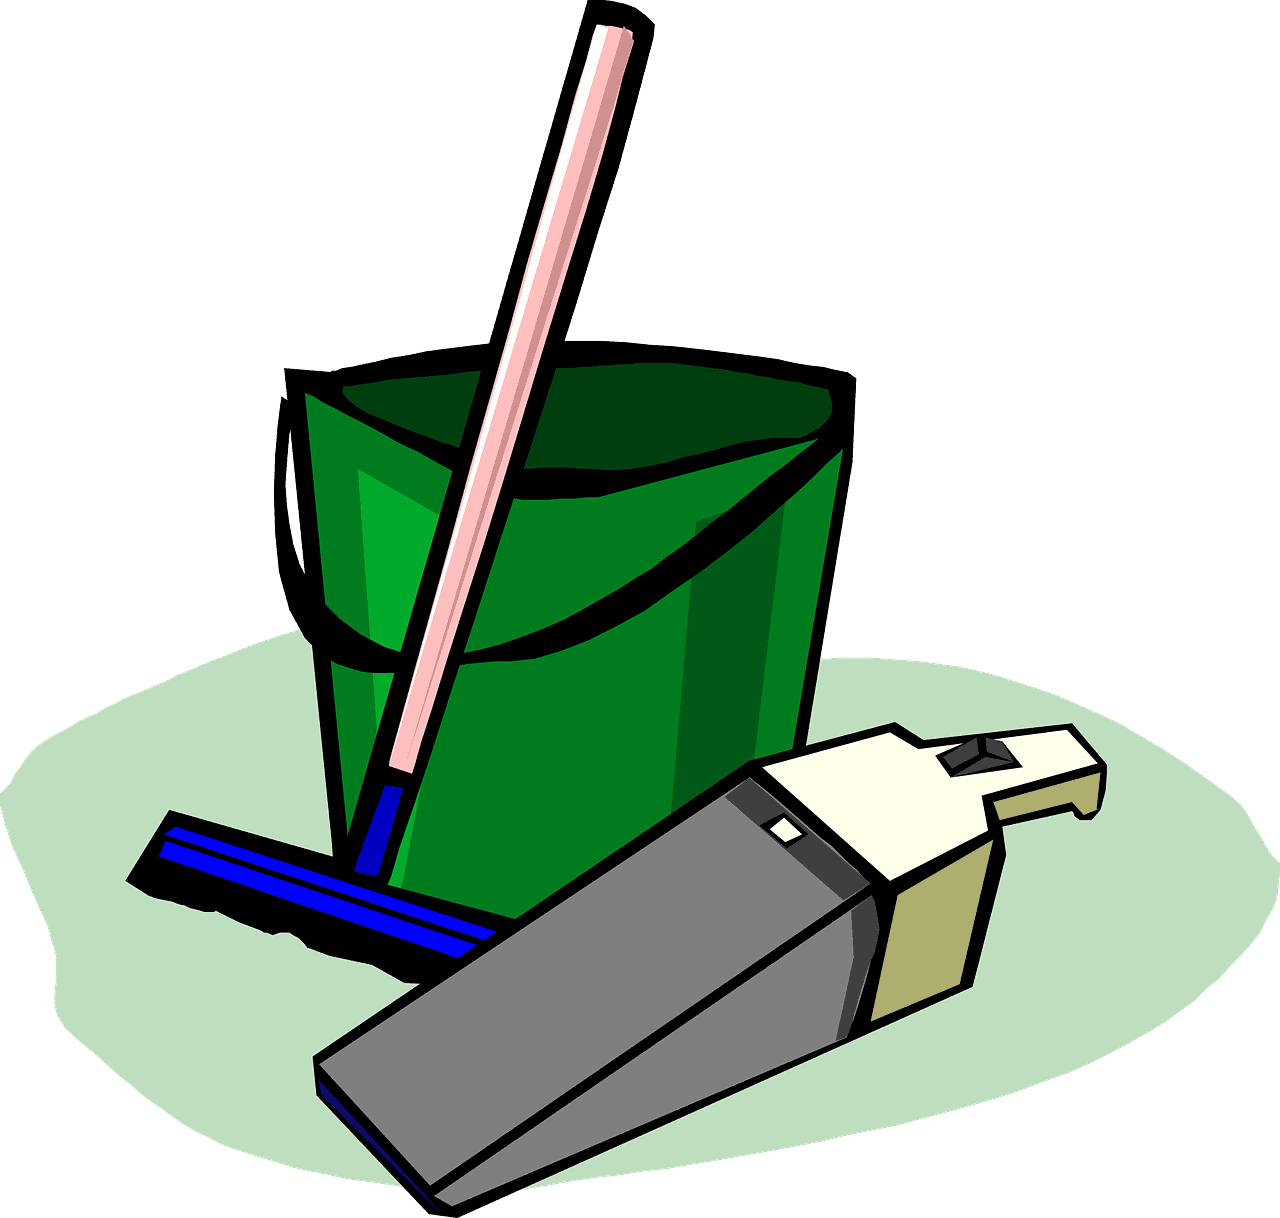 bucket, cleaning, supplies-303265.jpg